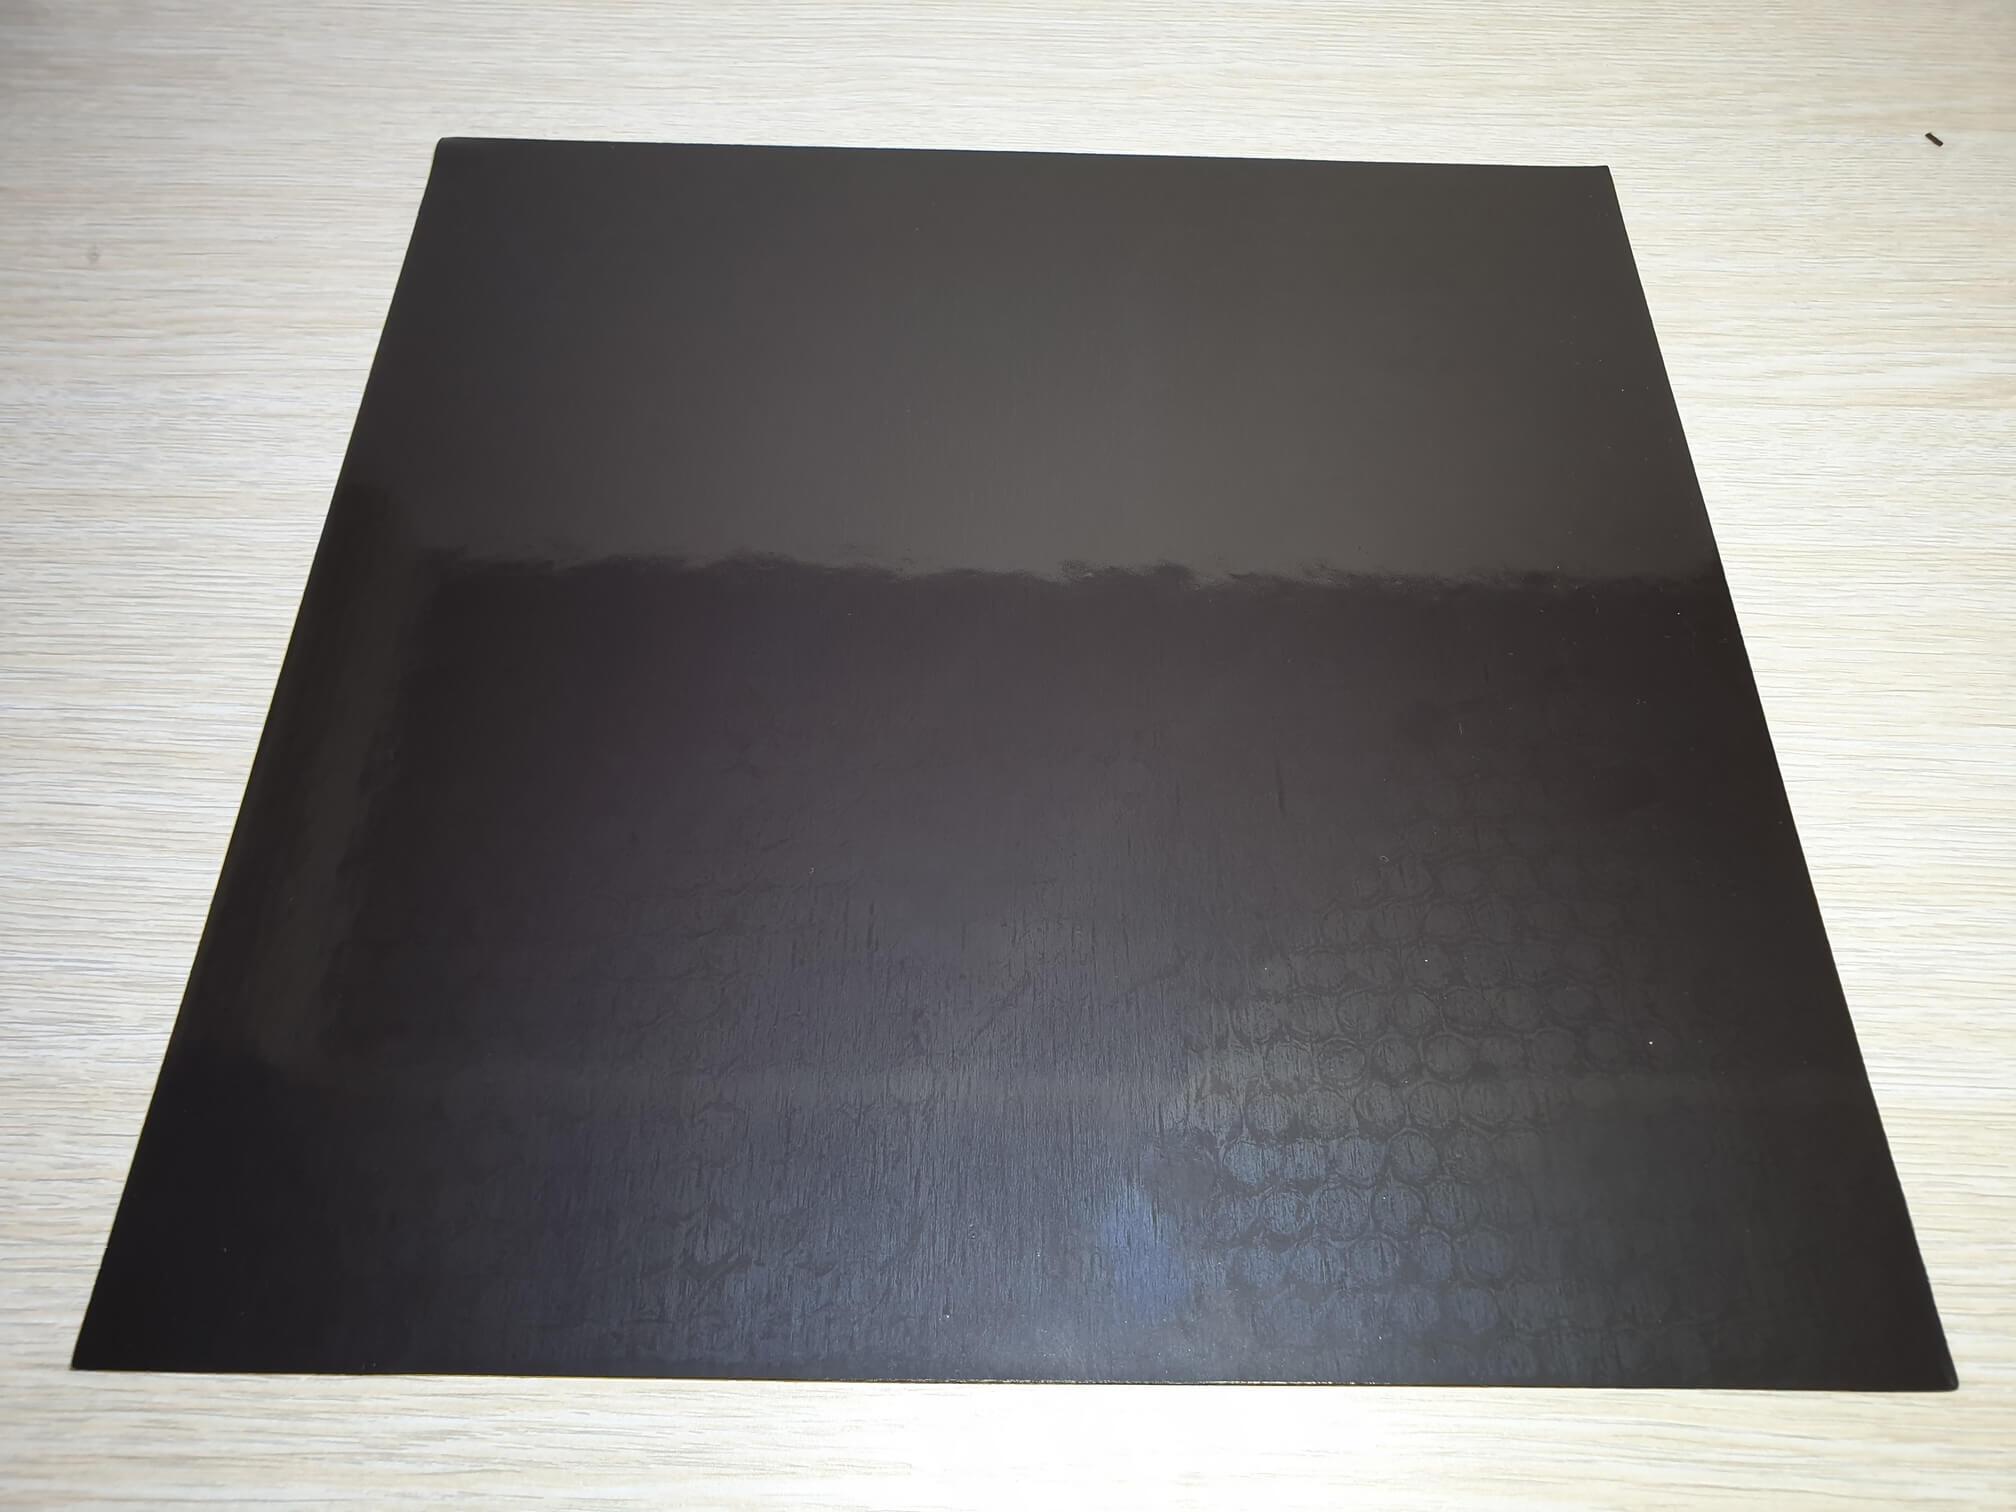 Textured PEI Powder Steel Plate from Banggood 3 | Textured PEI Powder Steel Plate from Banggood